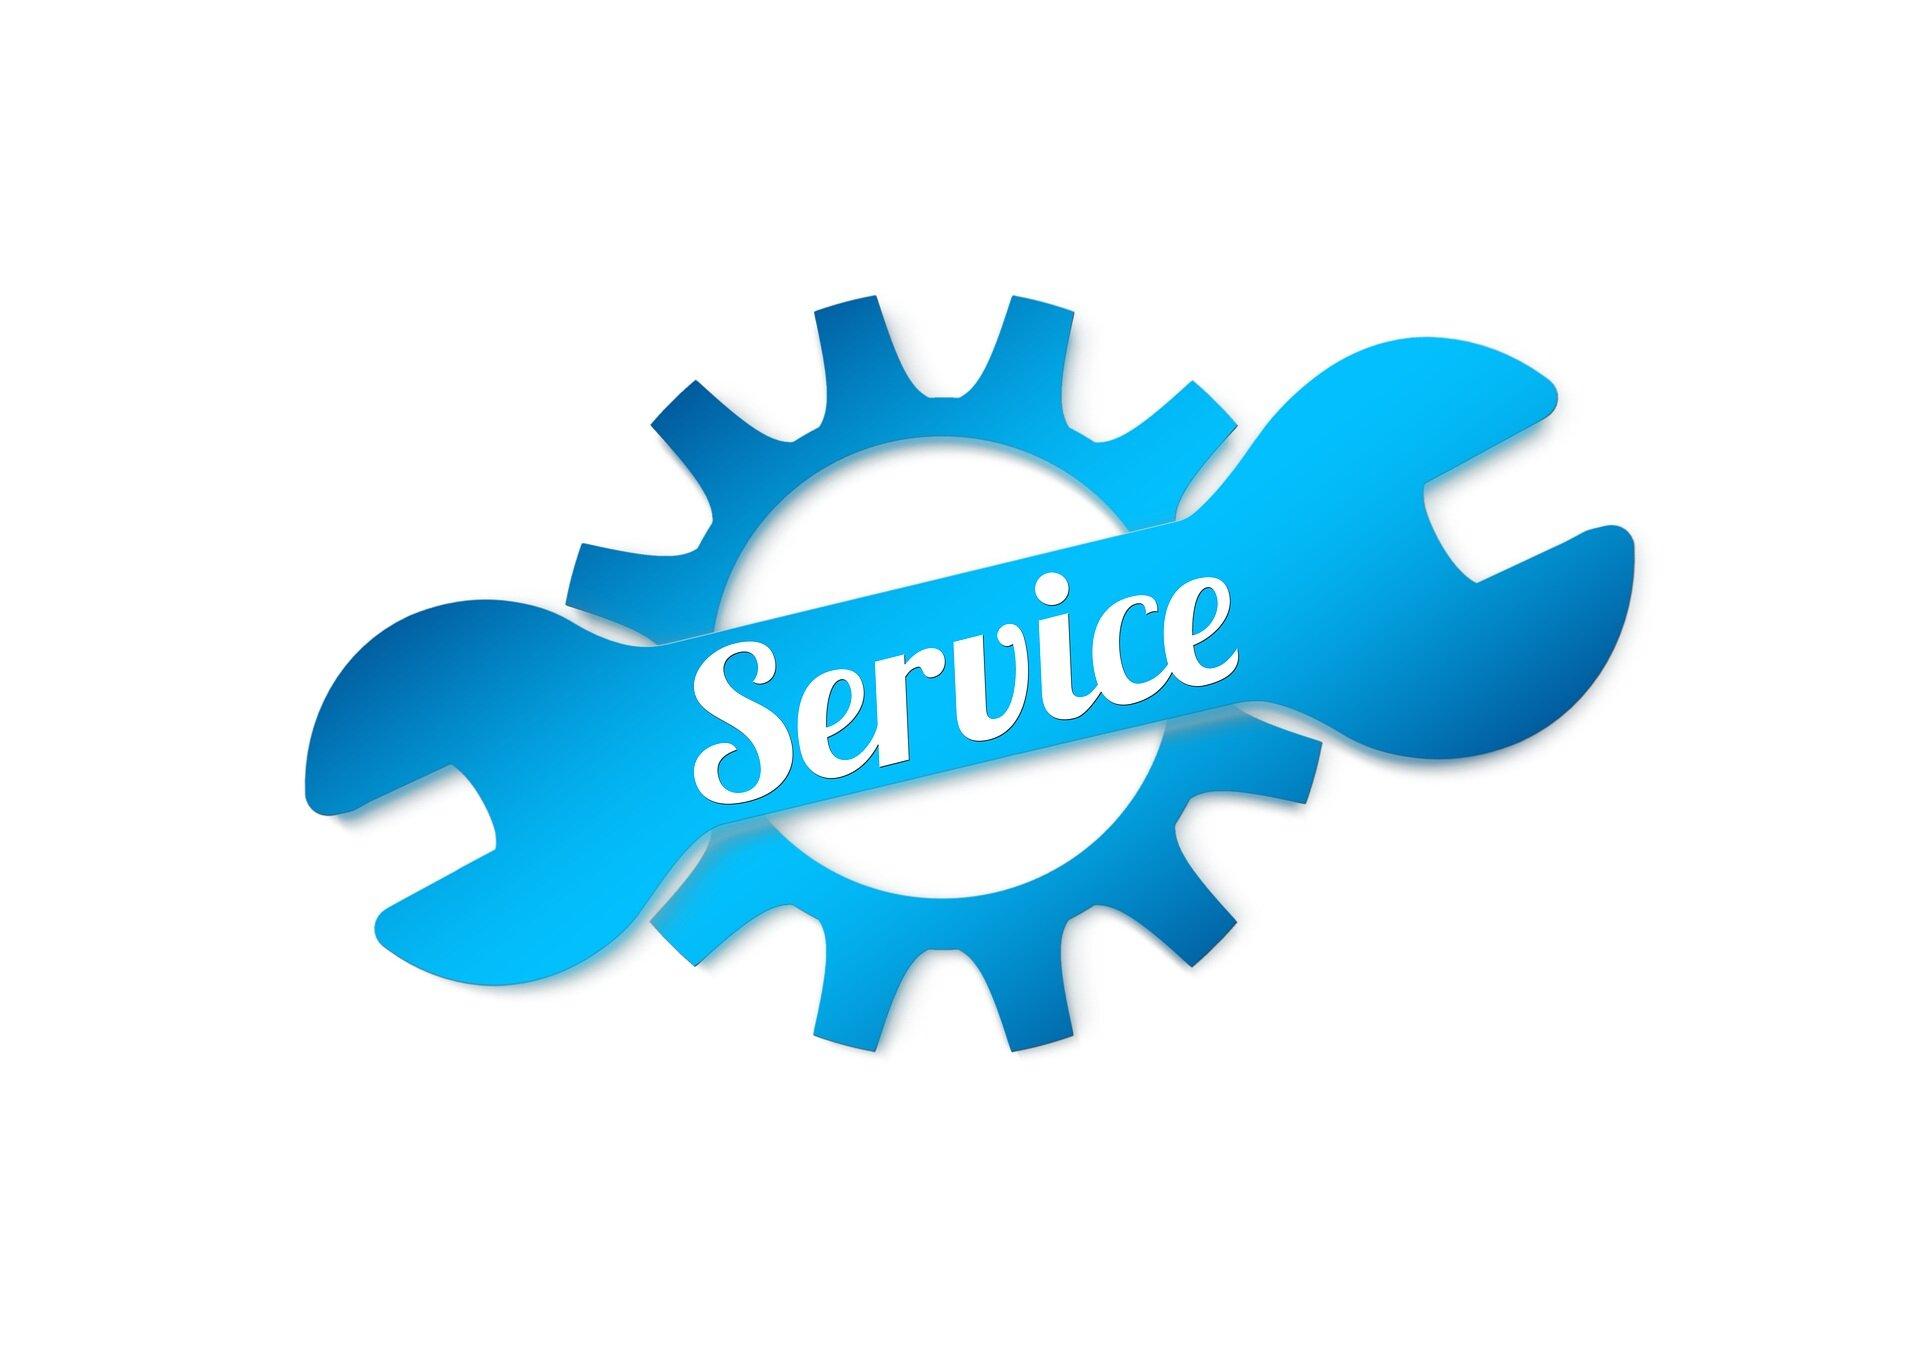 service-1220327_1920.jpg